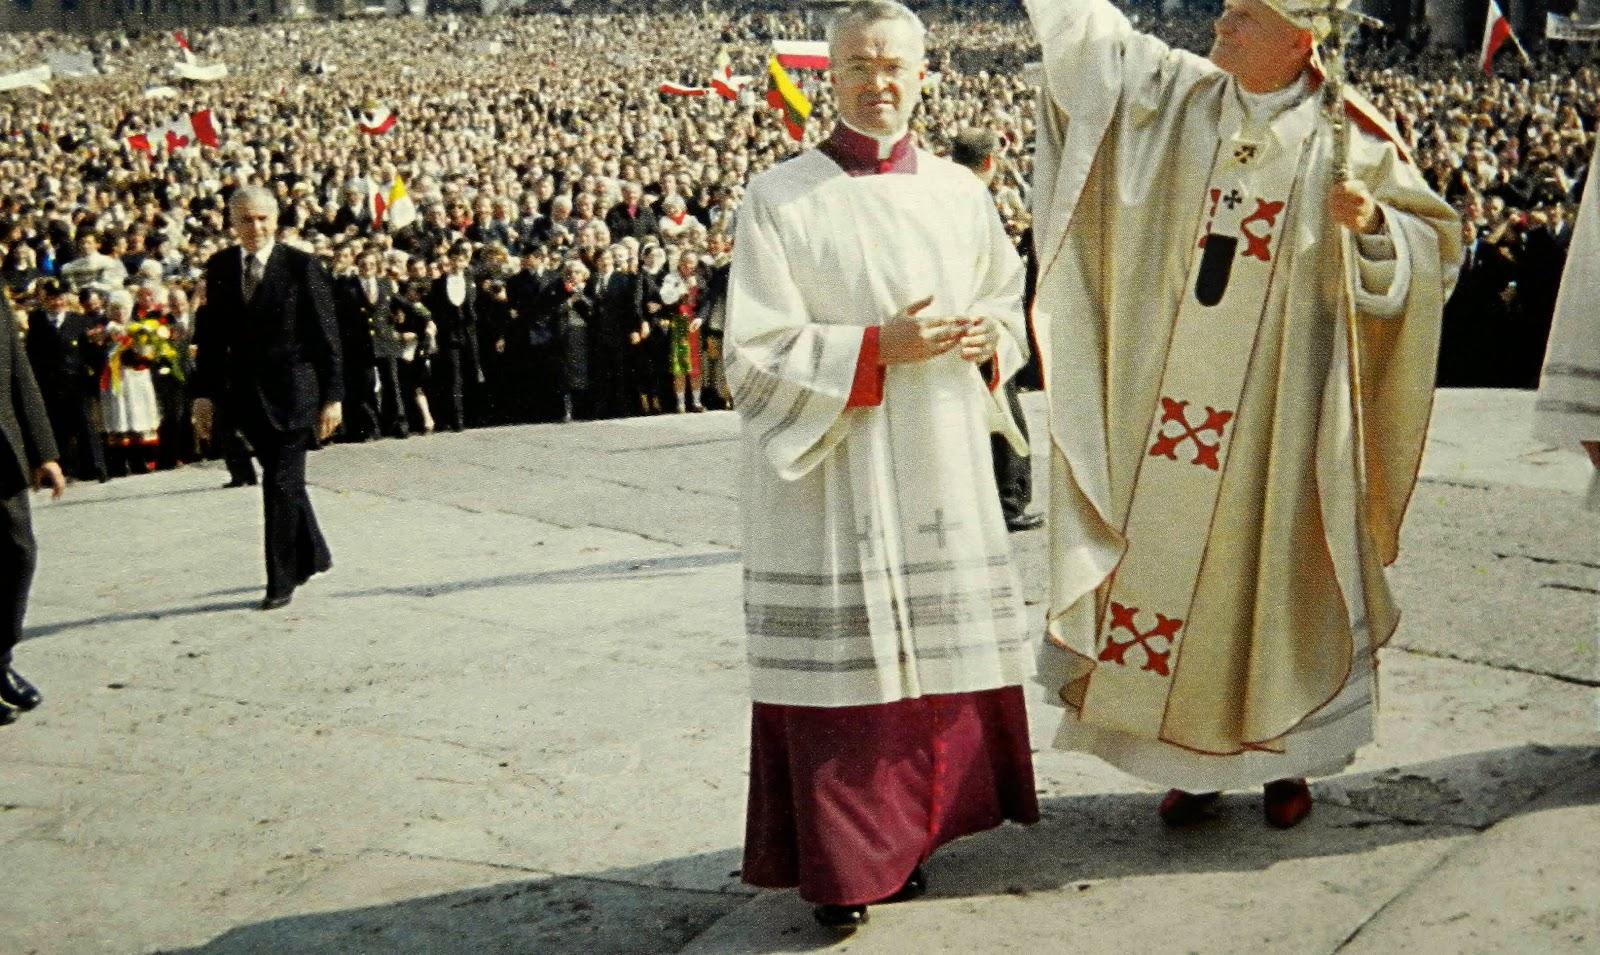 St. John Paul II at his inauguration Mass